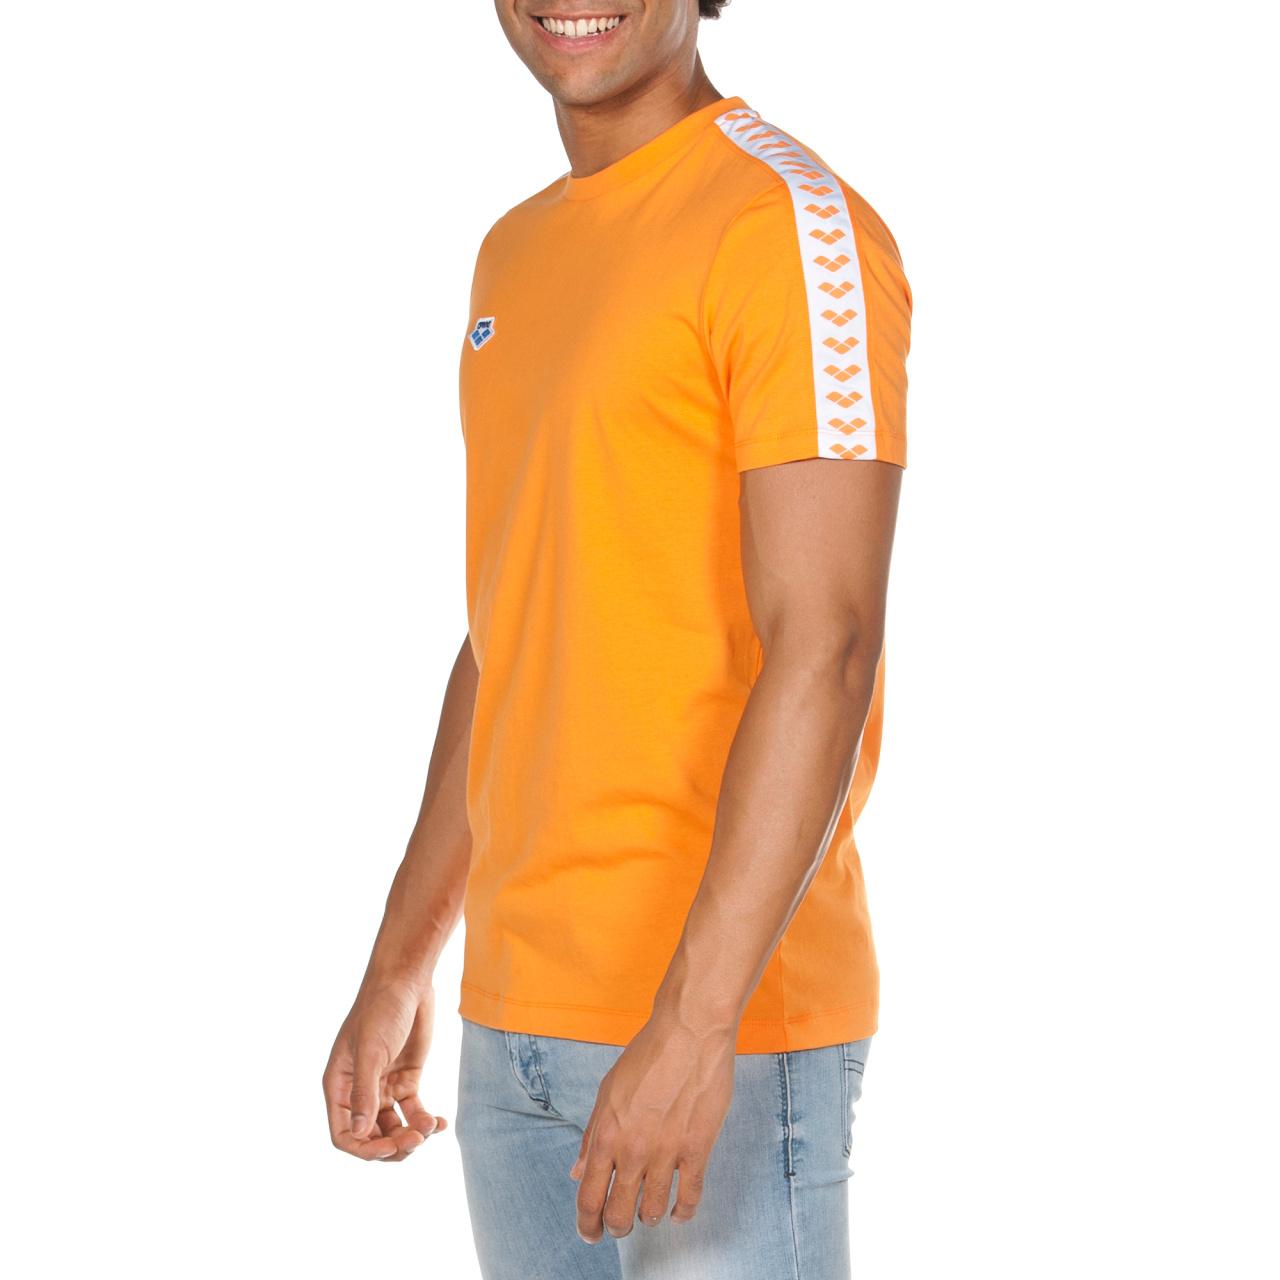 Camiseta Icons arena para Hombre Relax Team_6769